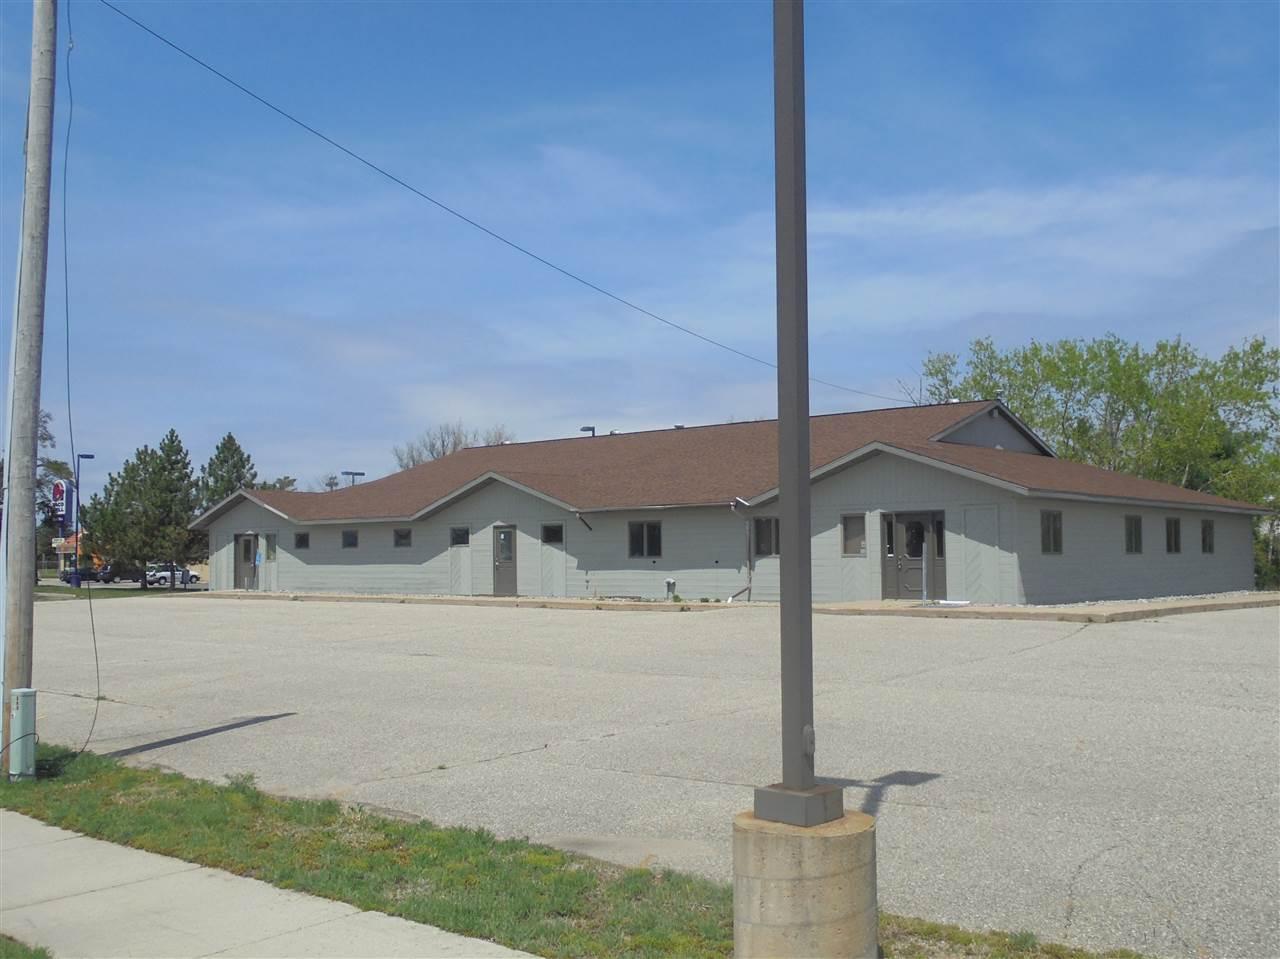 Real Estate for Sale, ListingId: 37219580, Grayling,MI49738